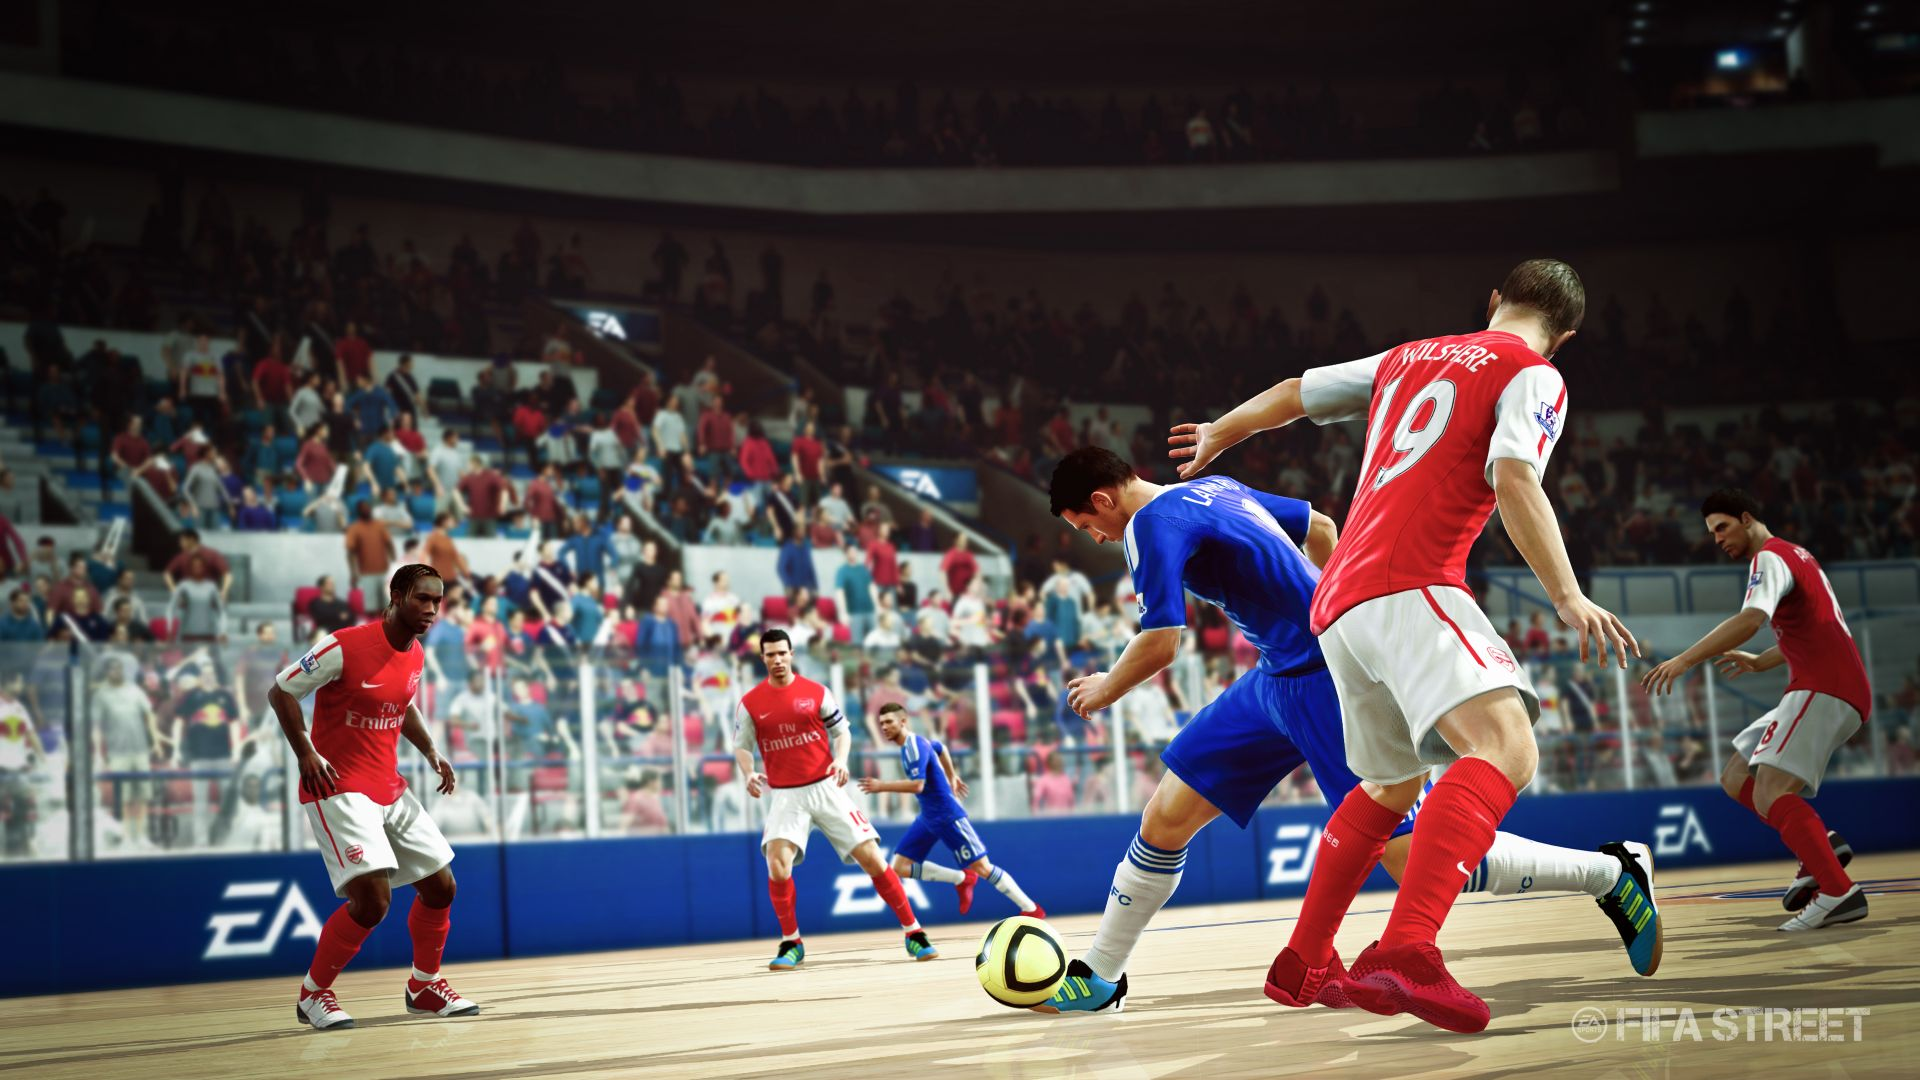 Screenshoty z FIFA Street 54264